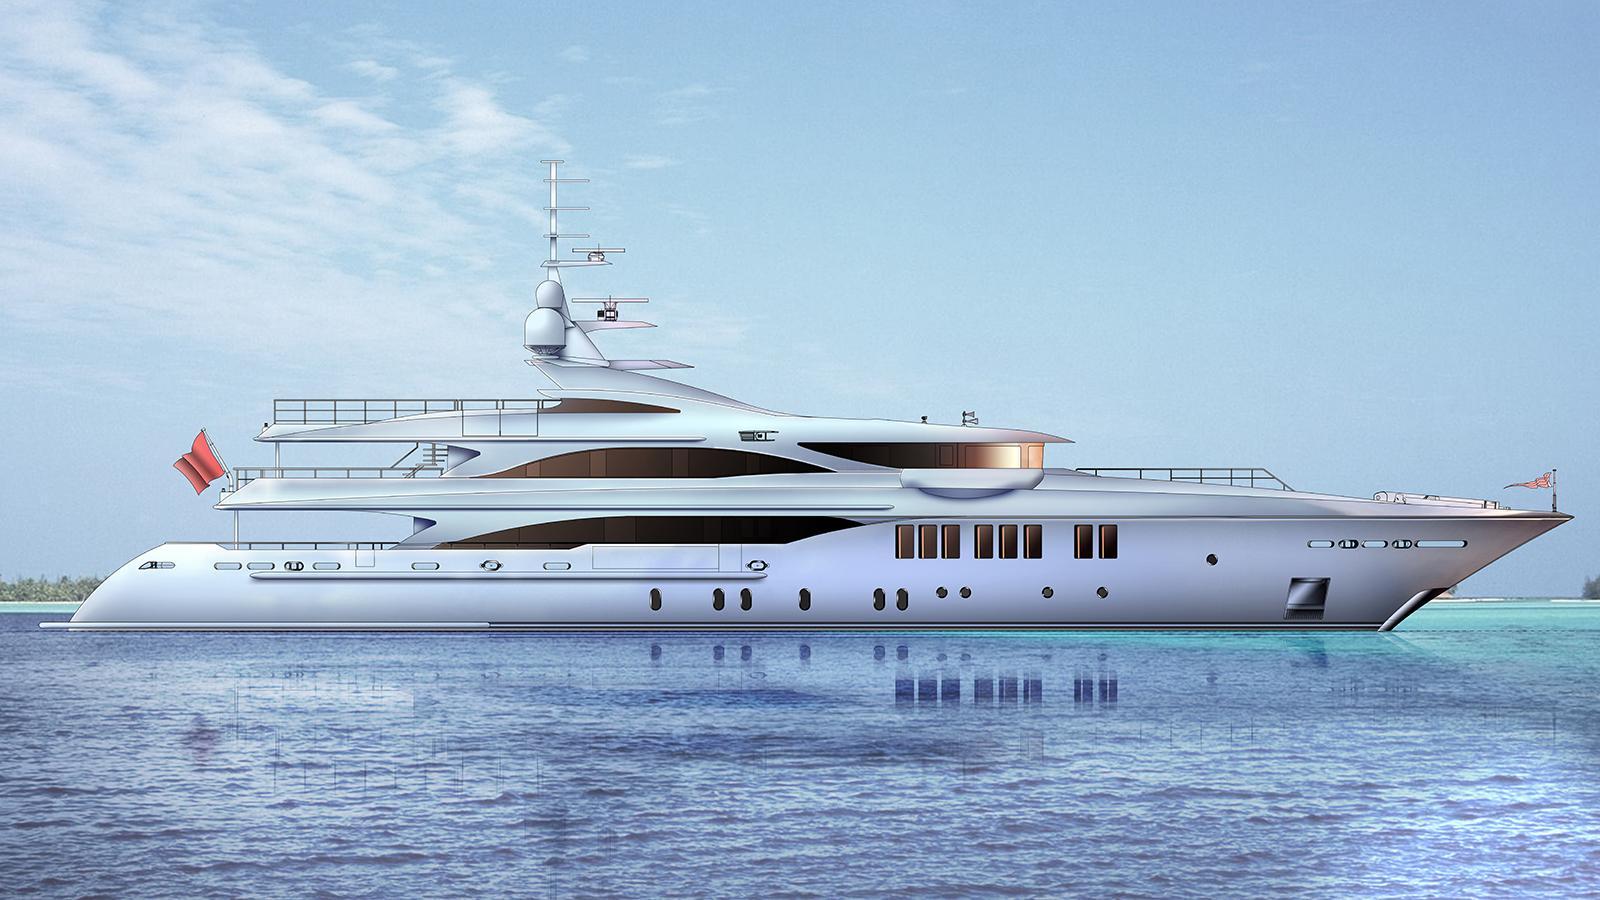 o mathilde motoryacht golden yachts 57m 2018 rendering profile